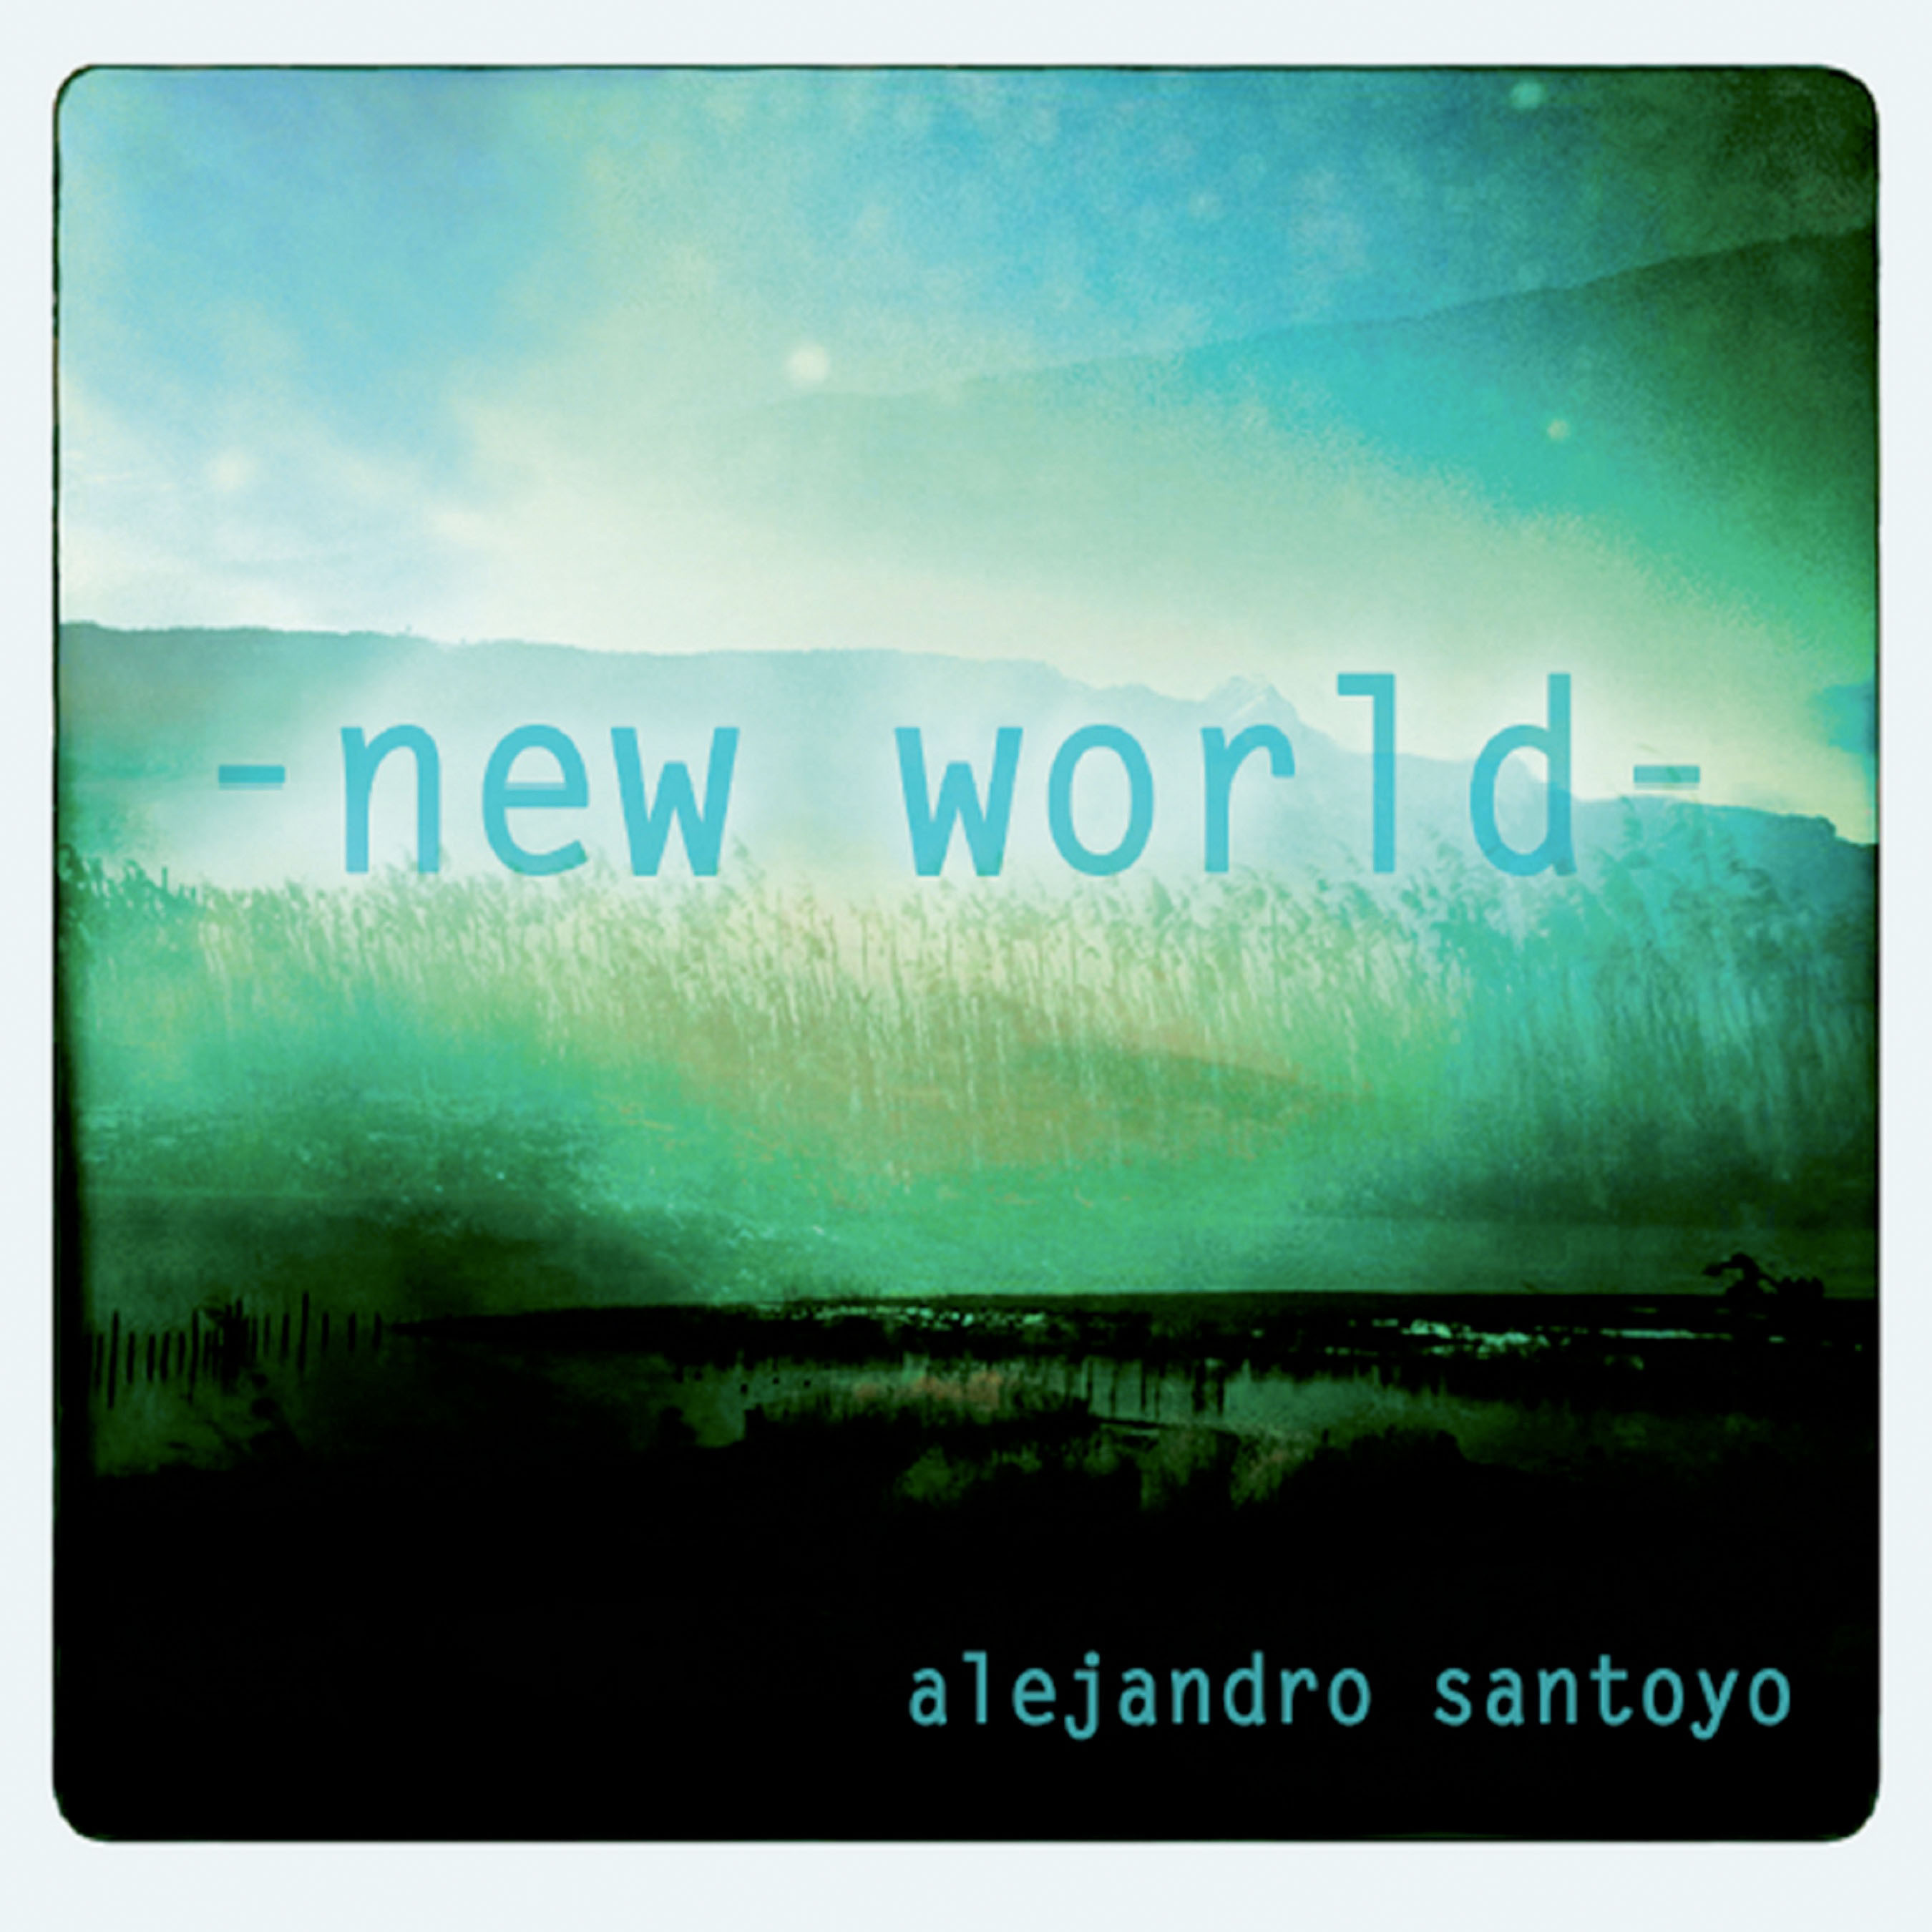 Pianist/Composer Alejandro Santoyo Releases New CD 'New World'